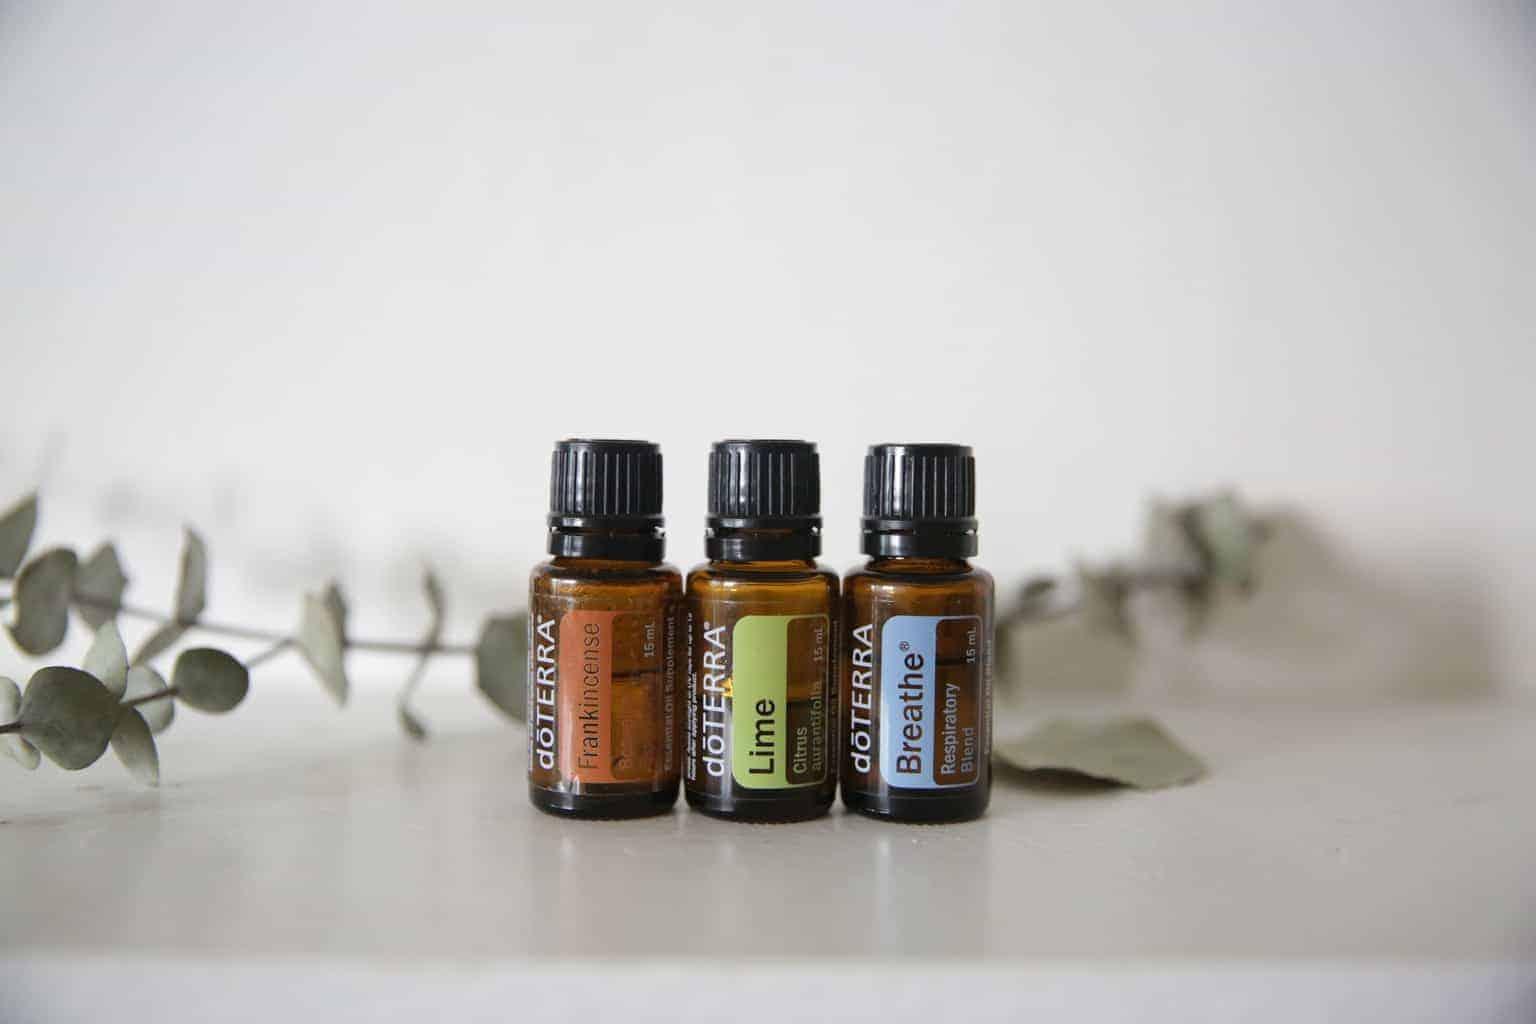 3 bottles of DoTERRA essential oils on table